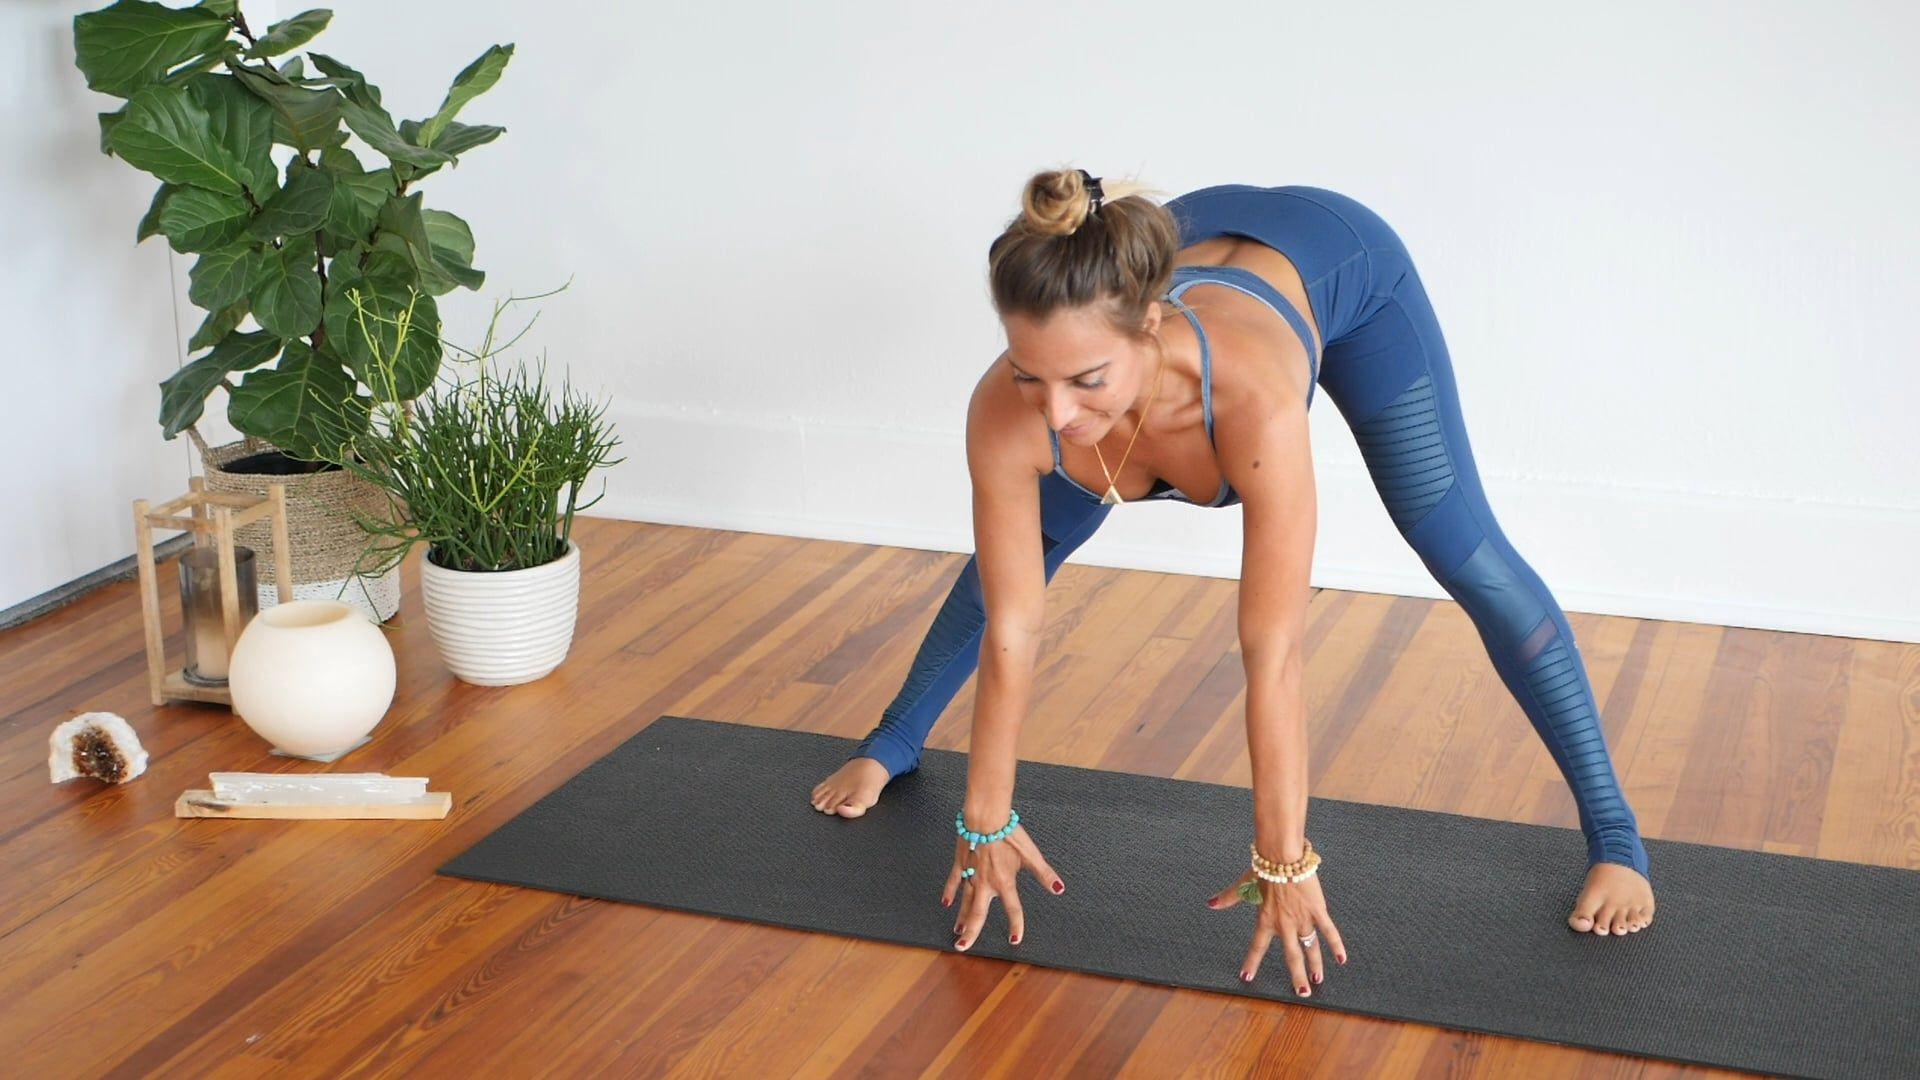 Bms studio sales page 1 online yoga mind body soul